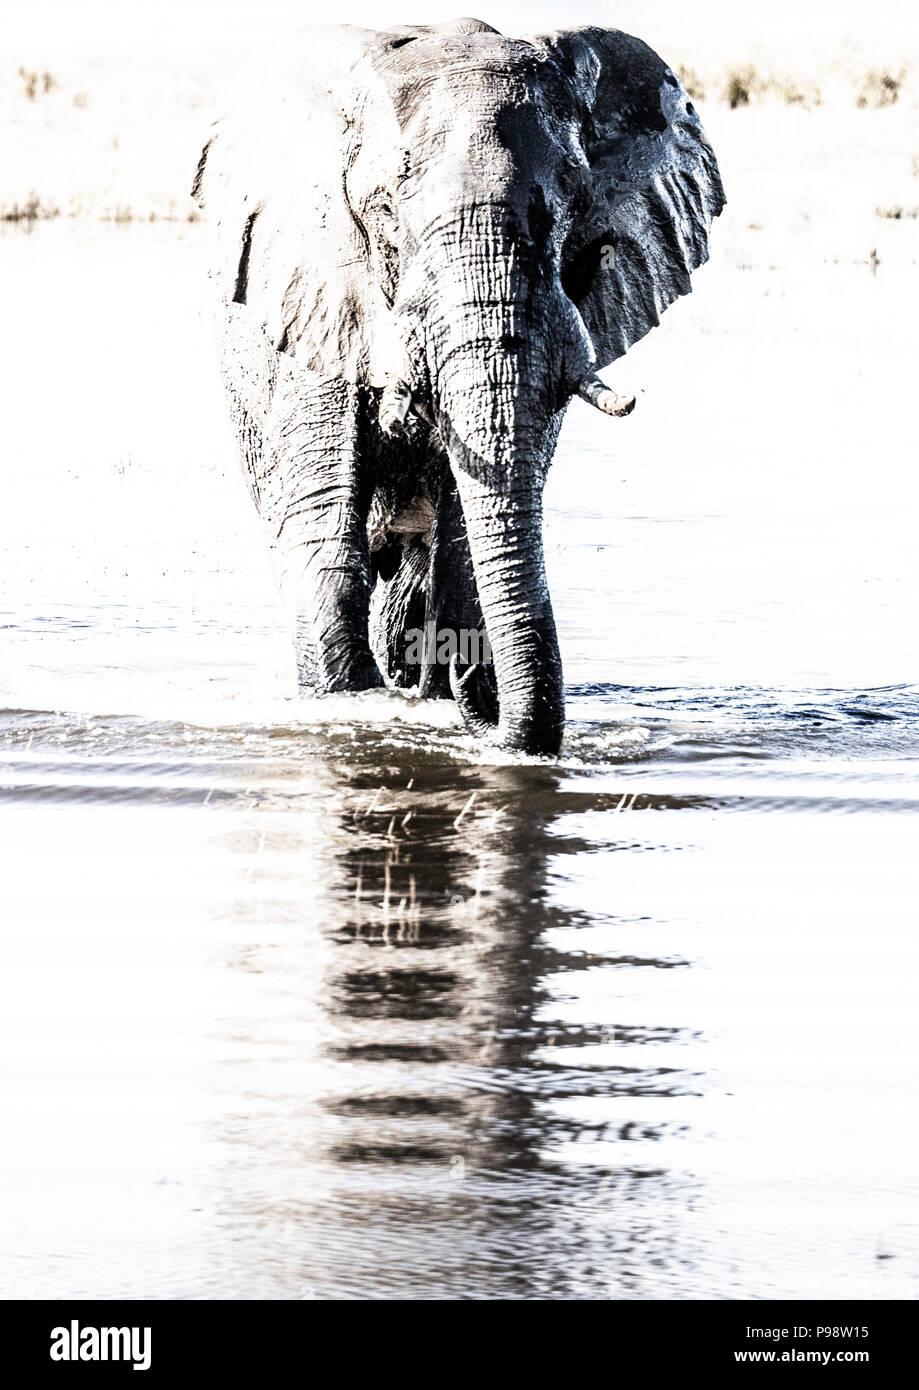 Elephants in the Chobe River, Botswana Namibia border. - Stock Image